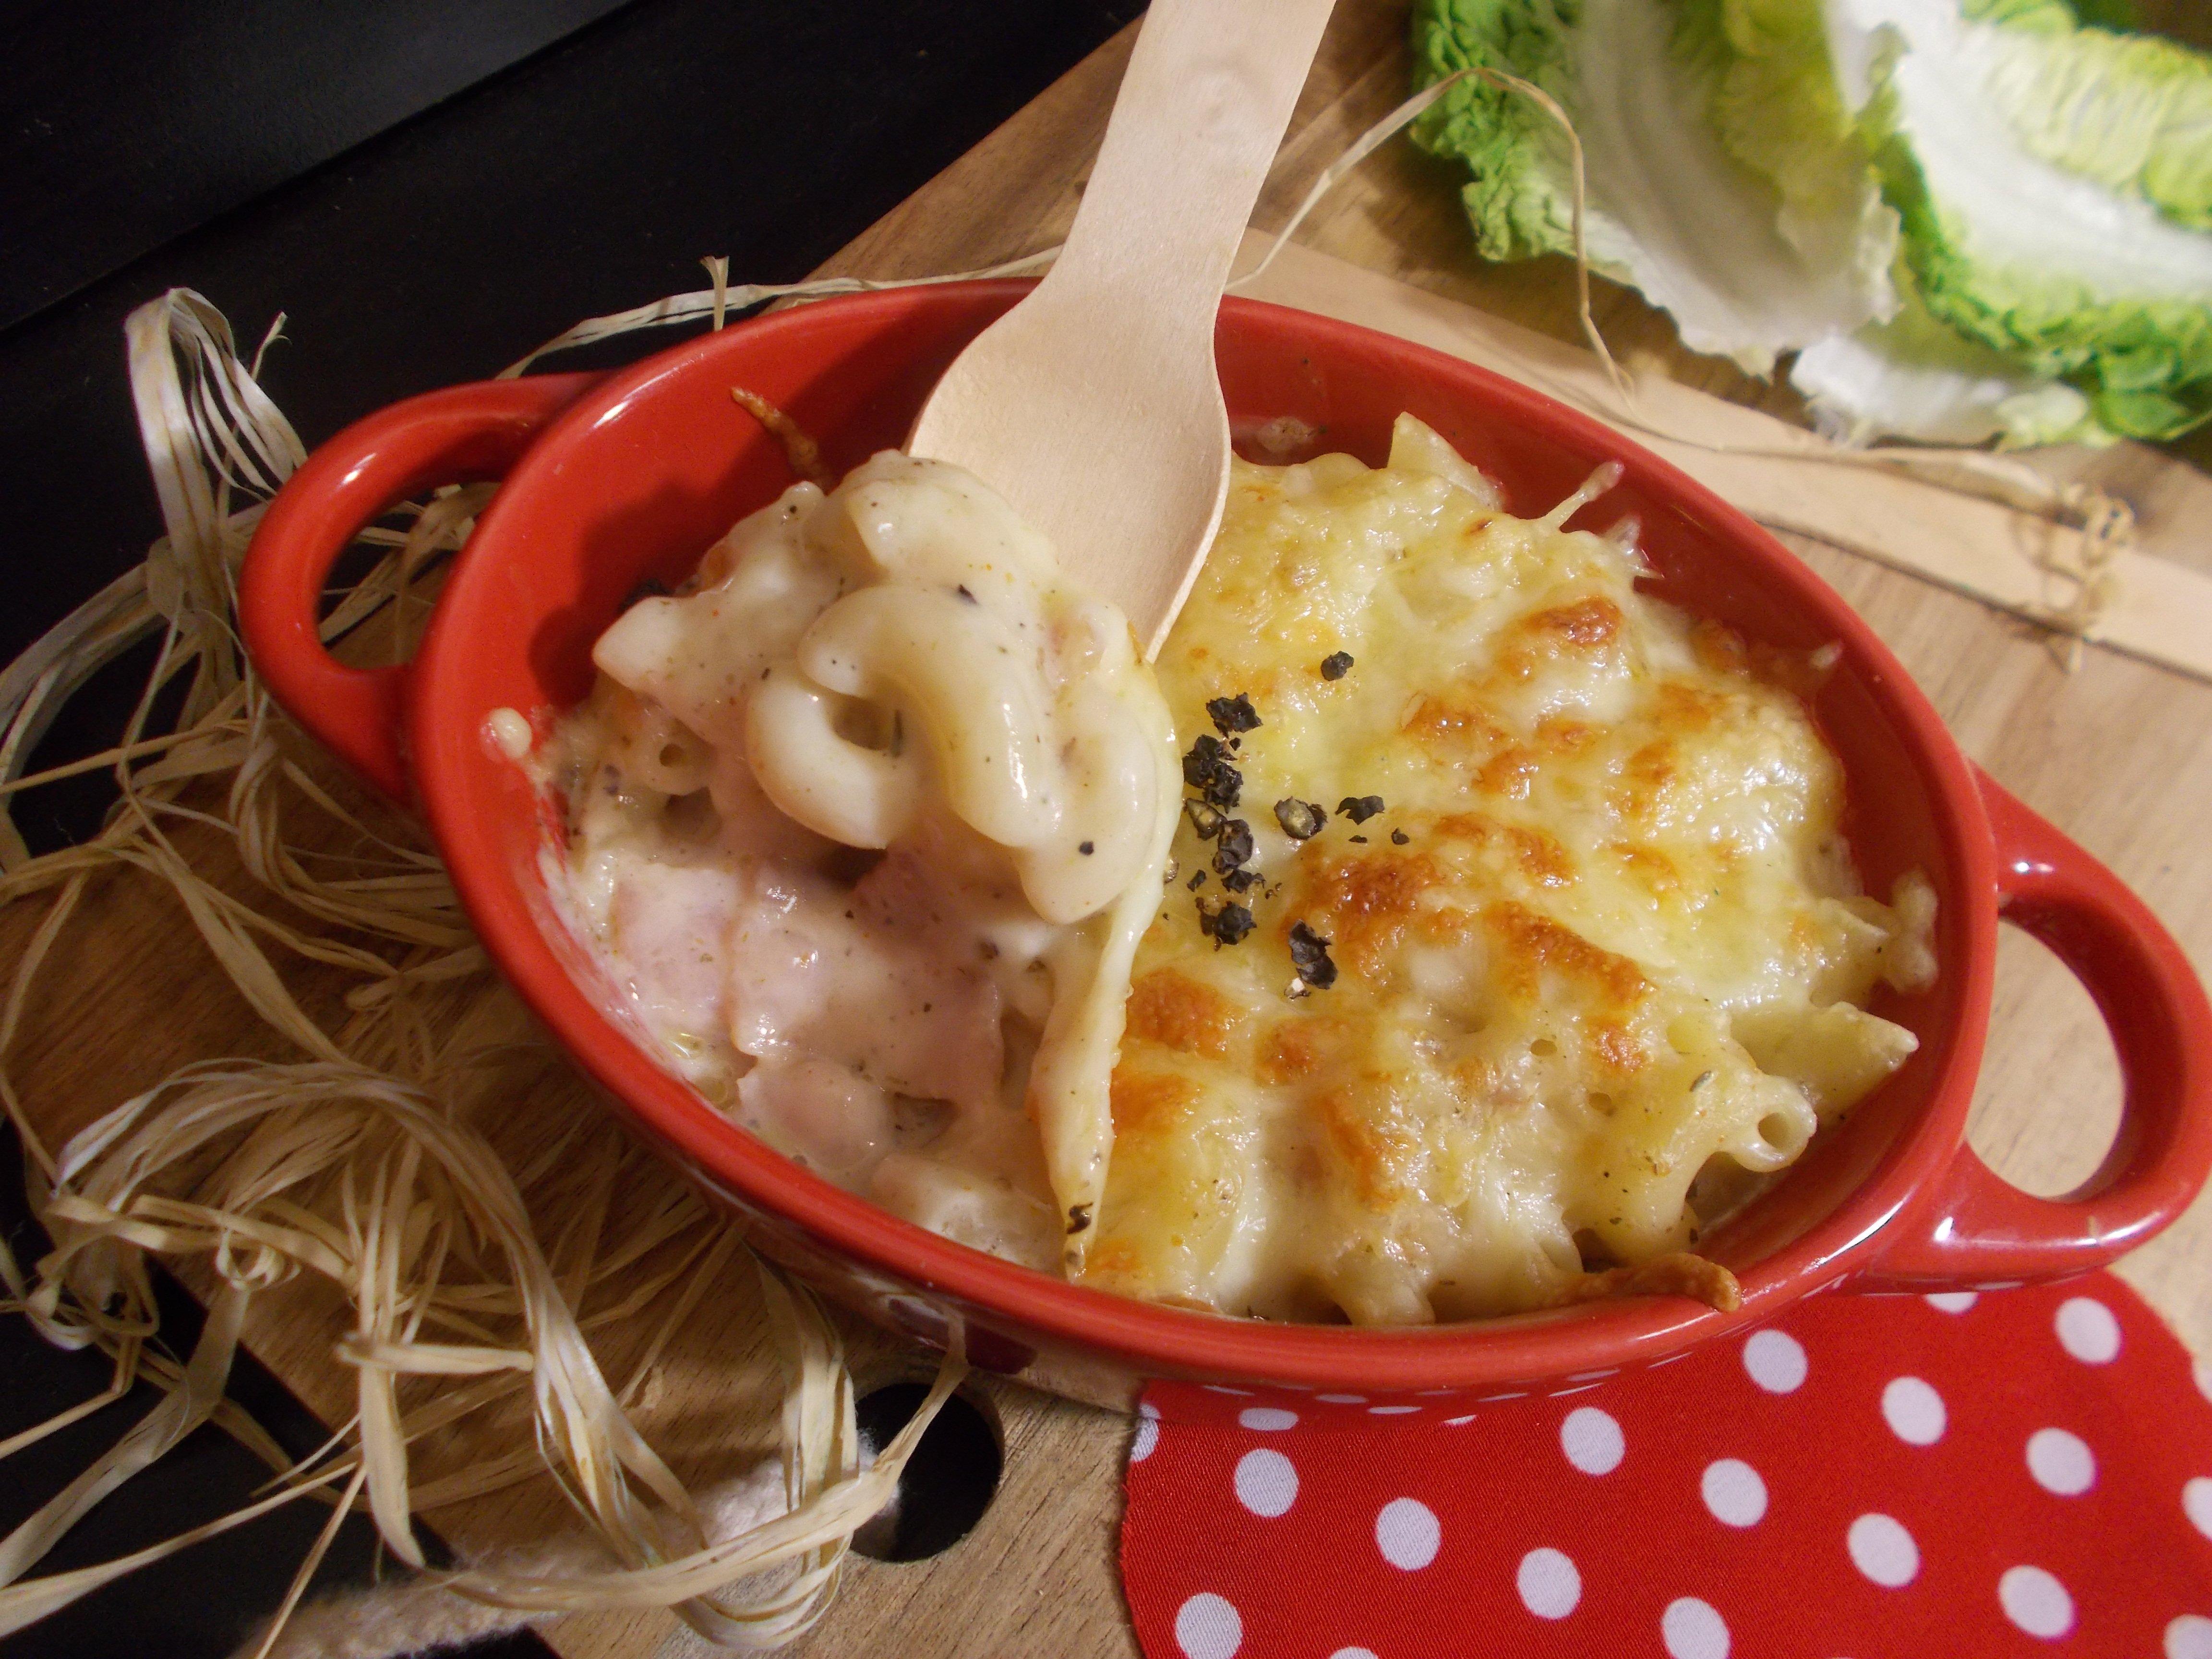 Smoky Mac'n'Cheese (gratin de pâte au fromage fumé)